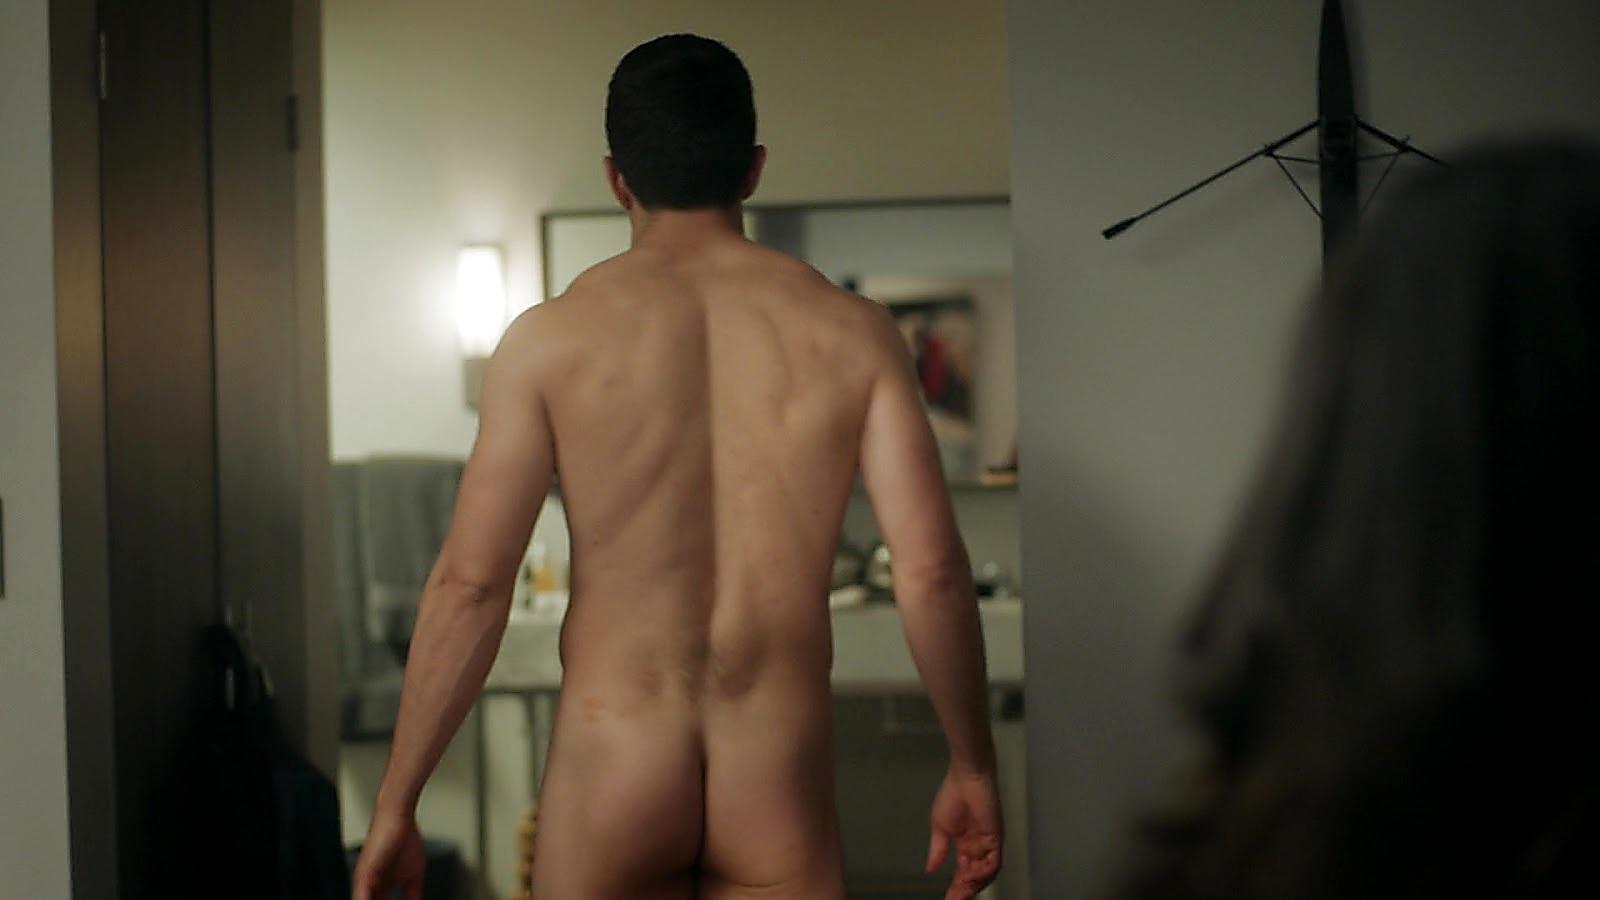 Adrian Gonzalez sexy shirtless scene May 17, 2020, 3pm